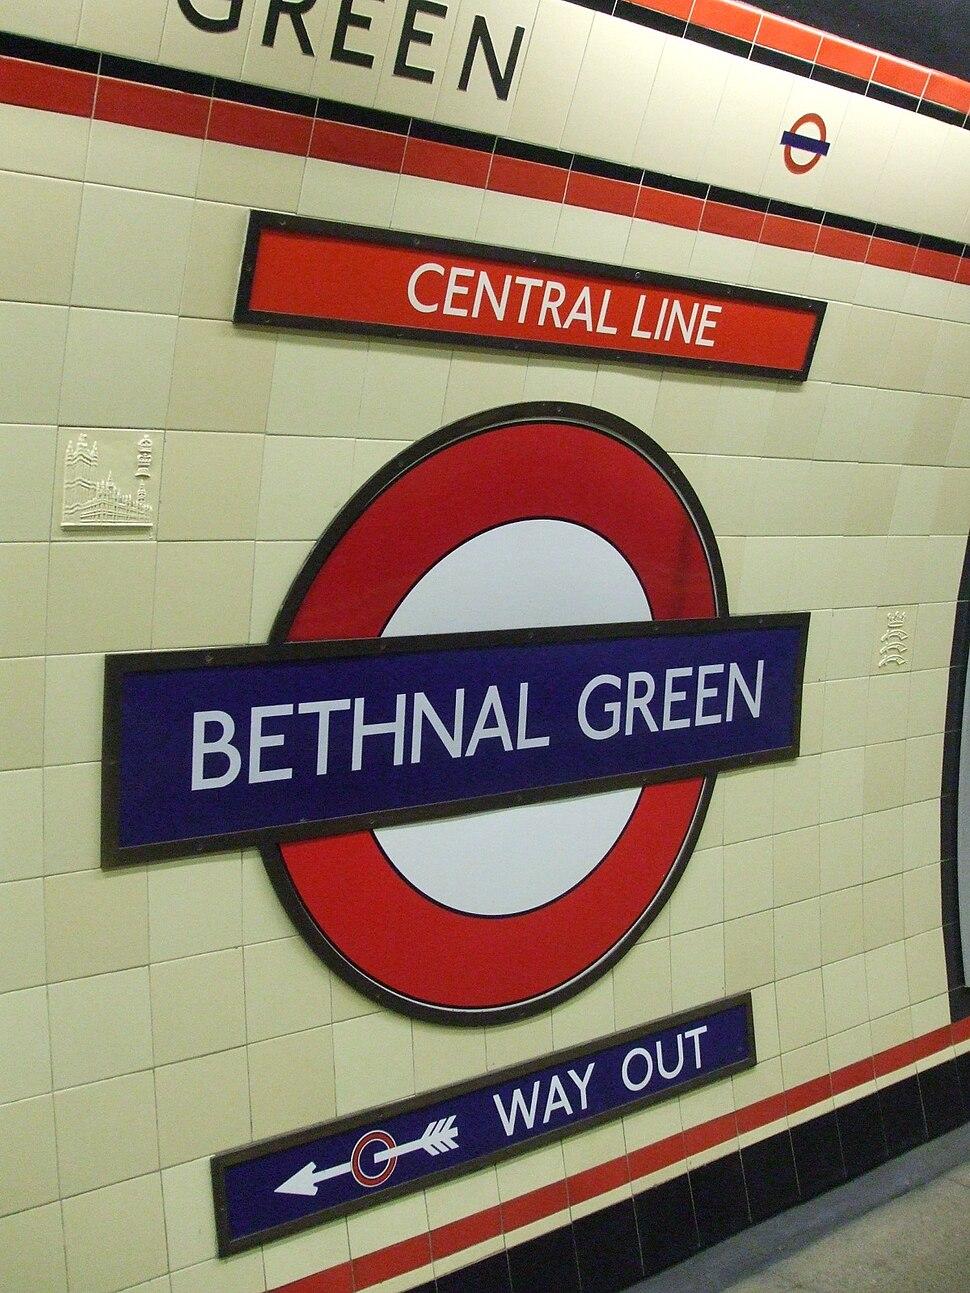 Bethnal Green stn roundel